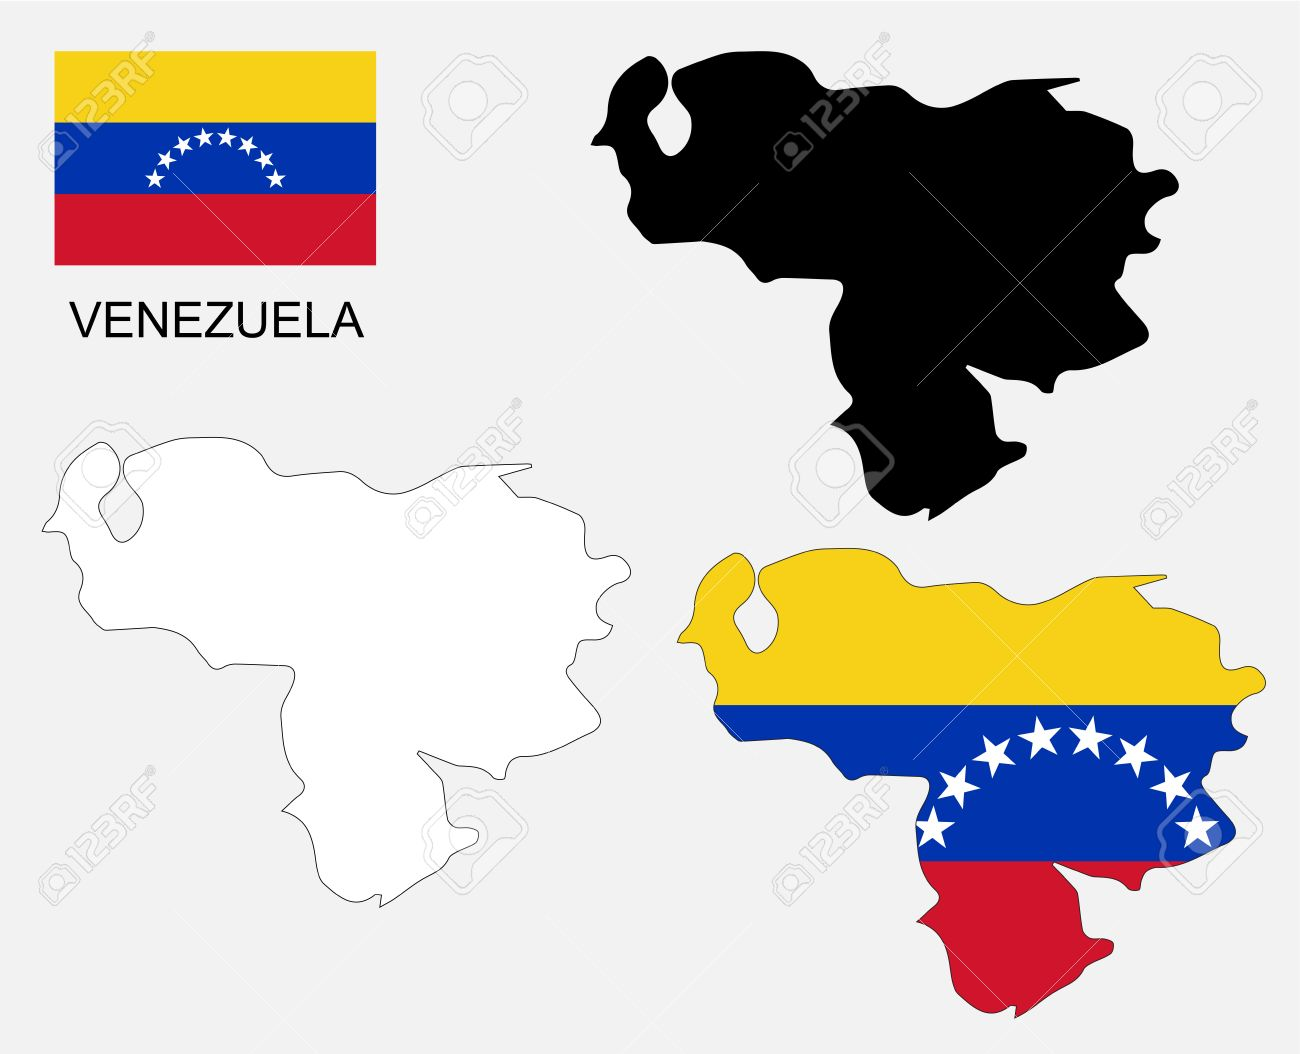 Venezuela Map And Flag Royalty Free Cliparts Vectors And Stock - Venezuela map